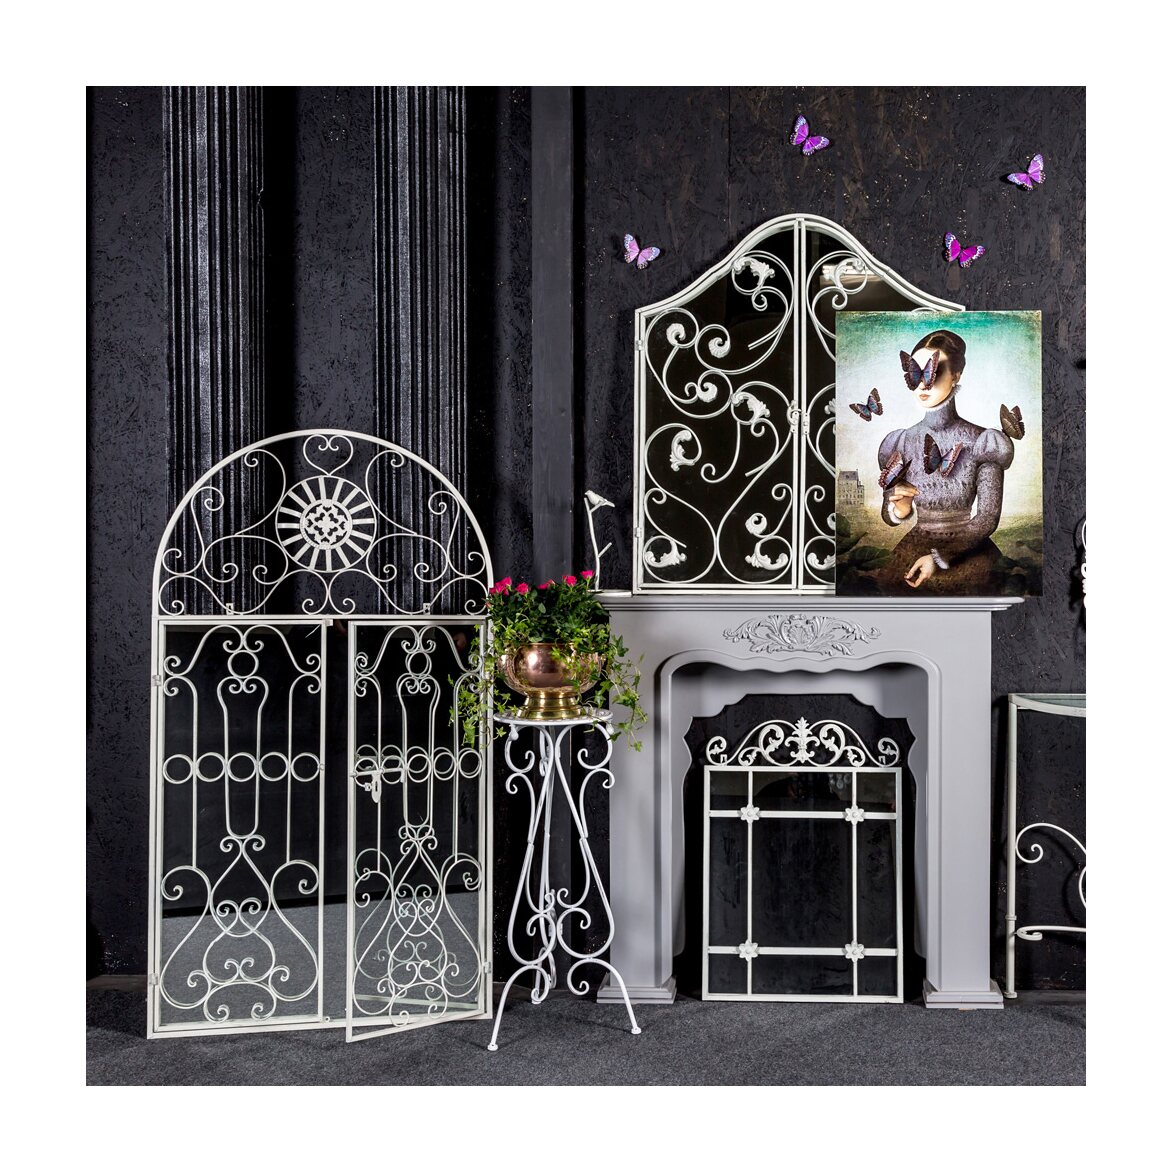 Настенное зеркало «Дивон» (белый антик) 4 | Настенные зеркала Kingsby